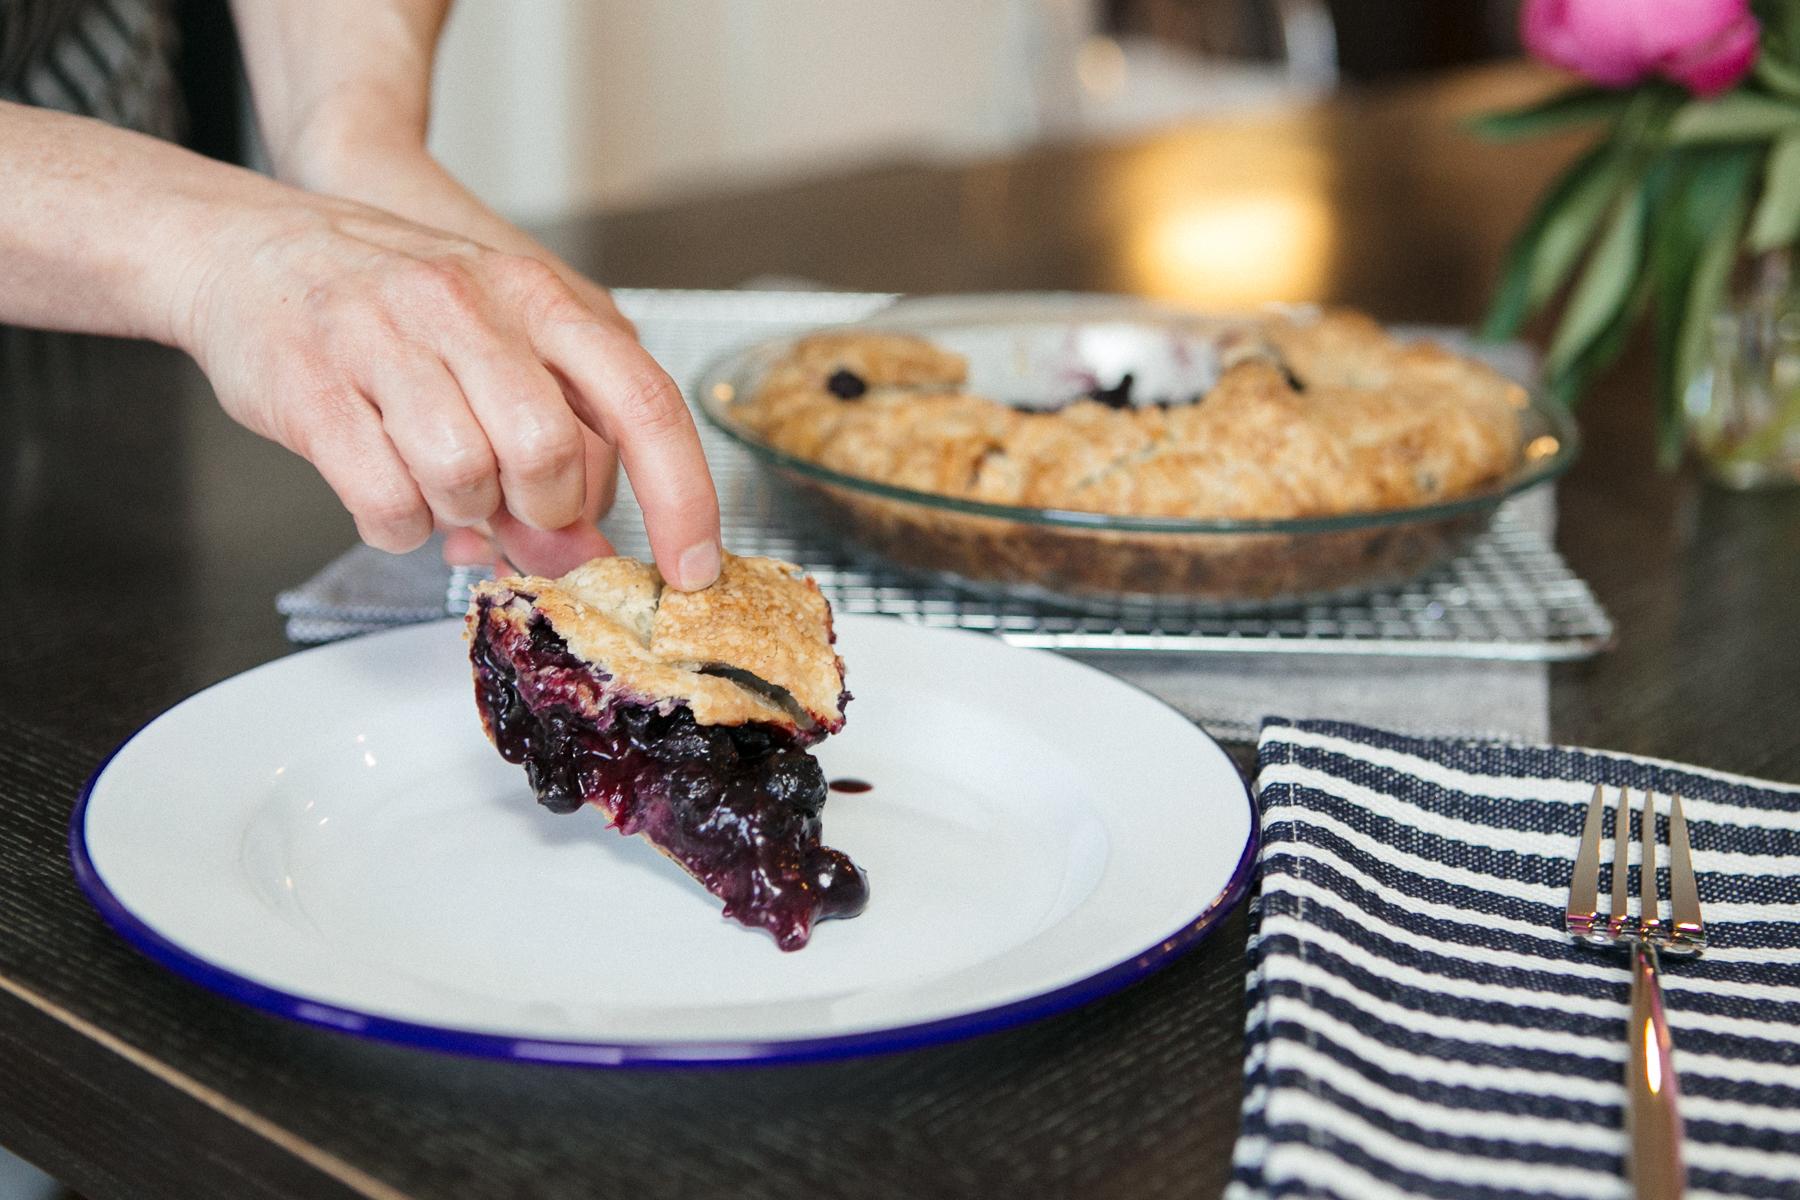 Rustic Blueberry Tart